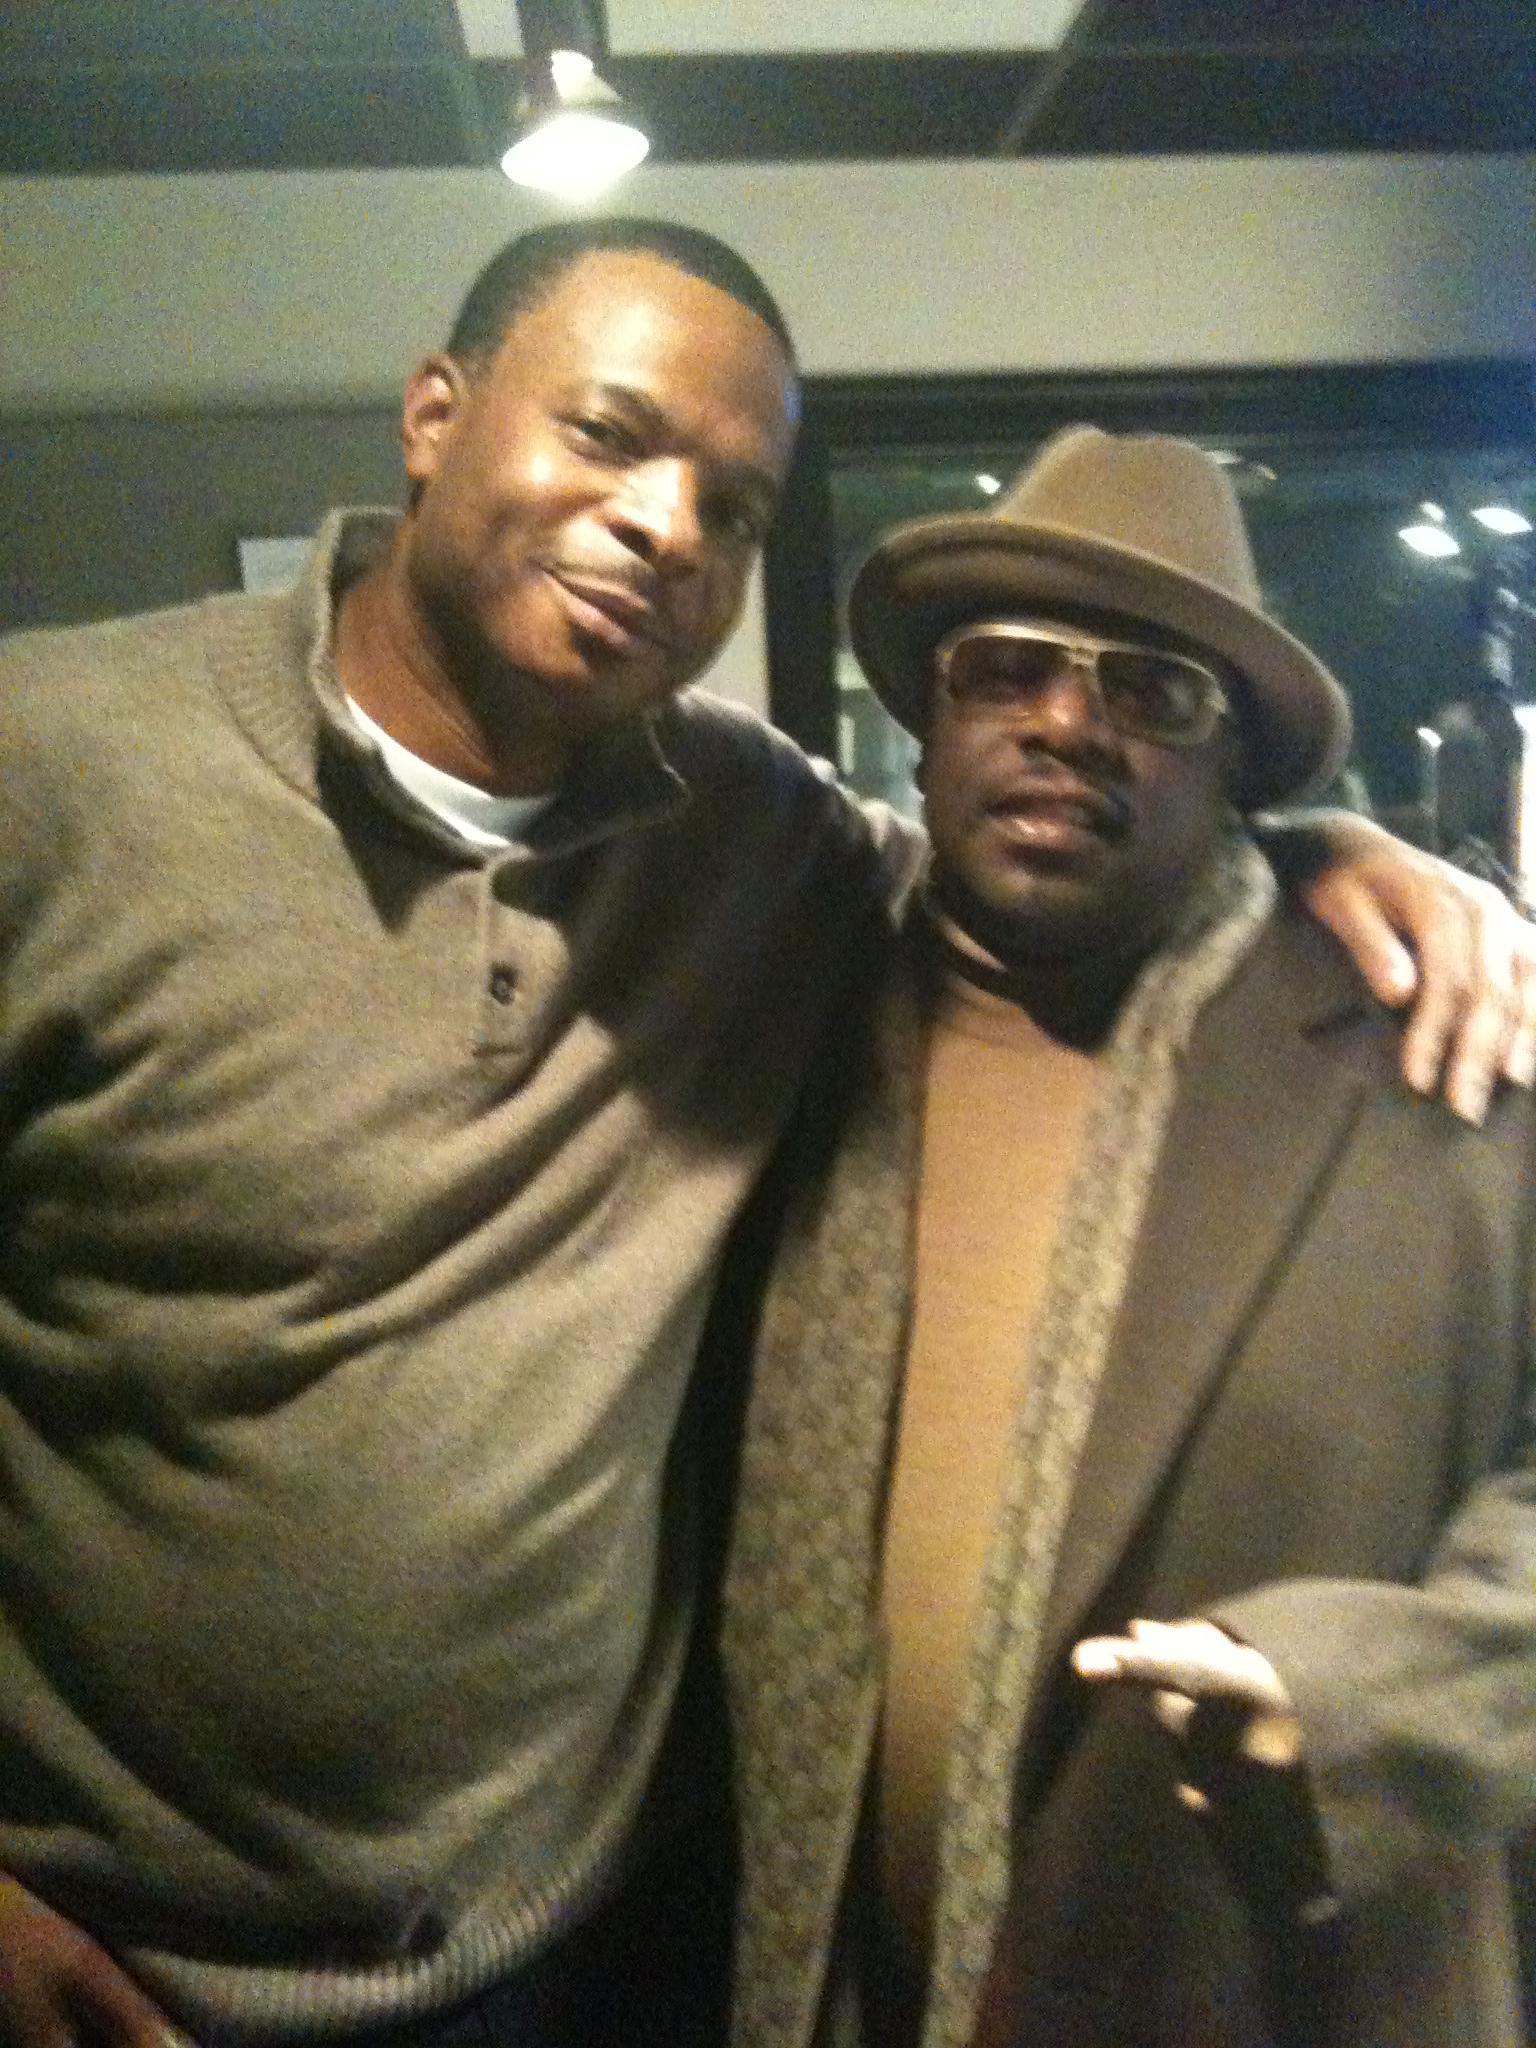 Dj Kut & Ced The Entertainer